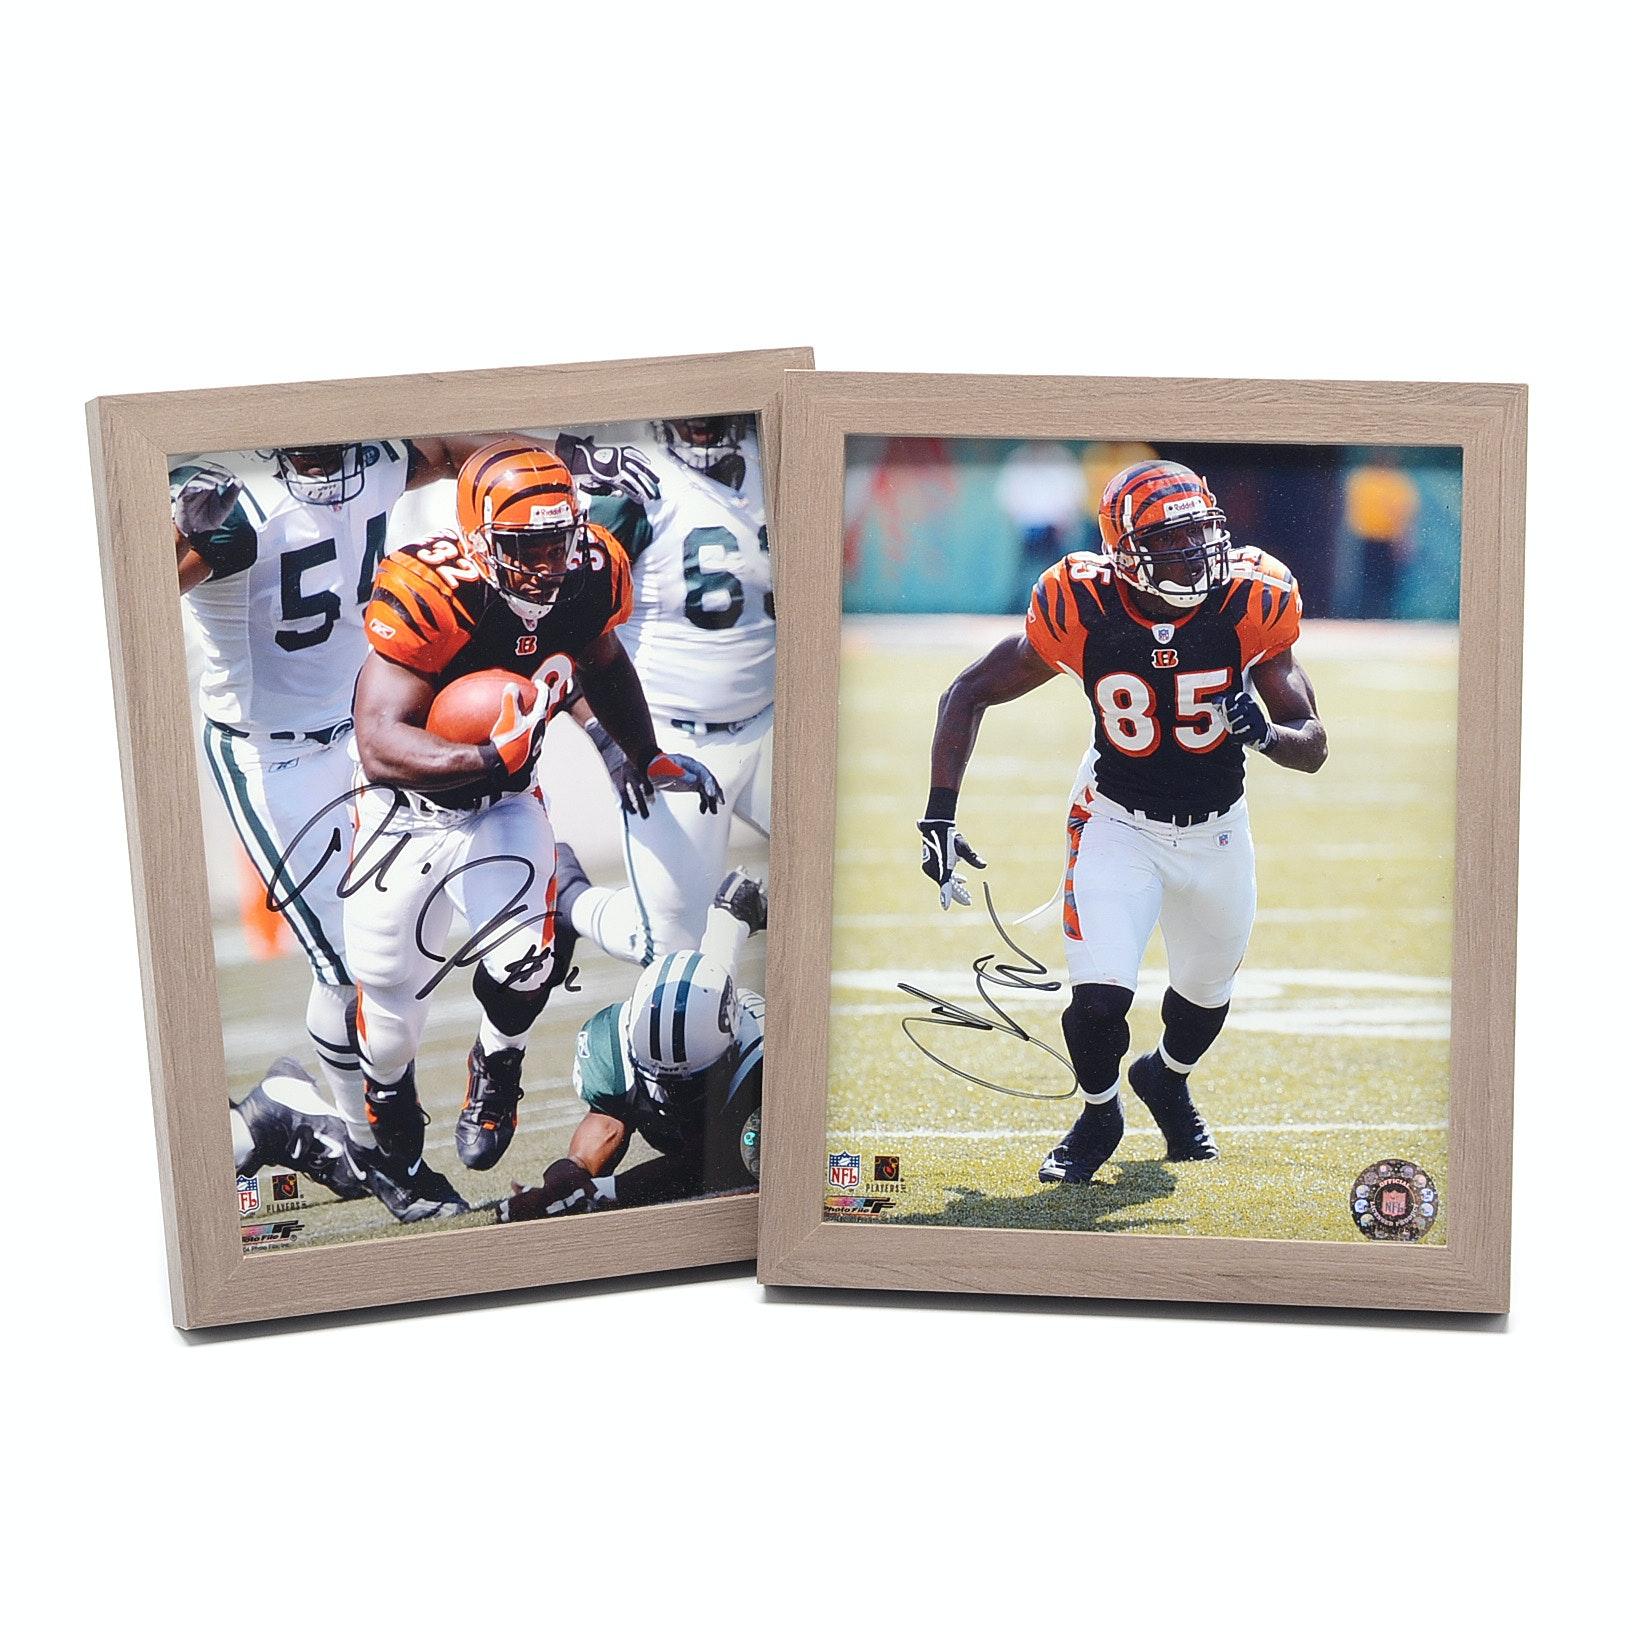 Rudi and Chad Johnson Cincinnati Bengals Signed NFL Framed Photo Prints